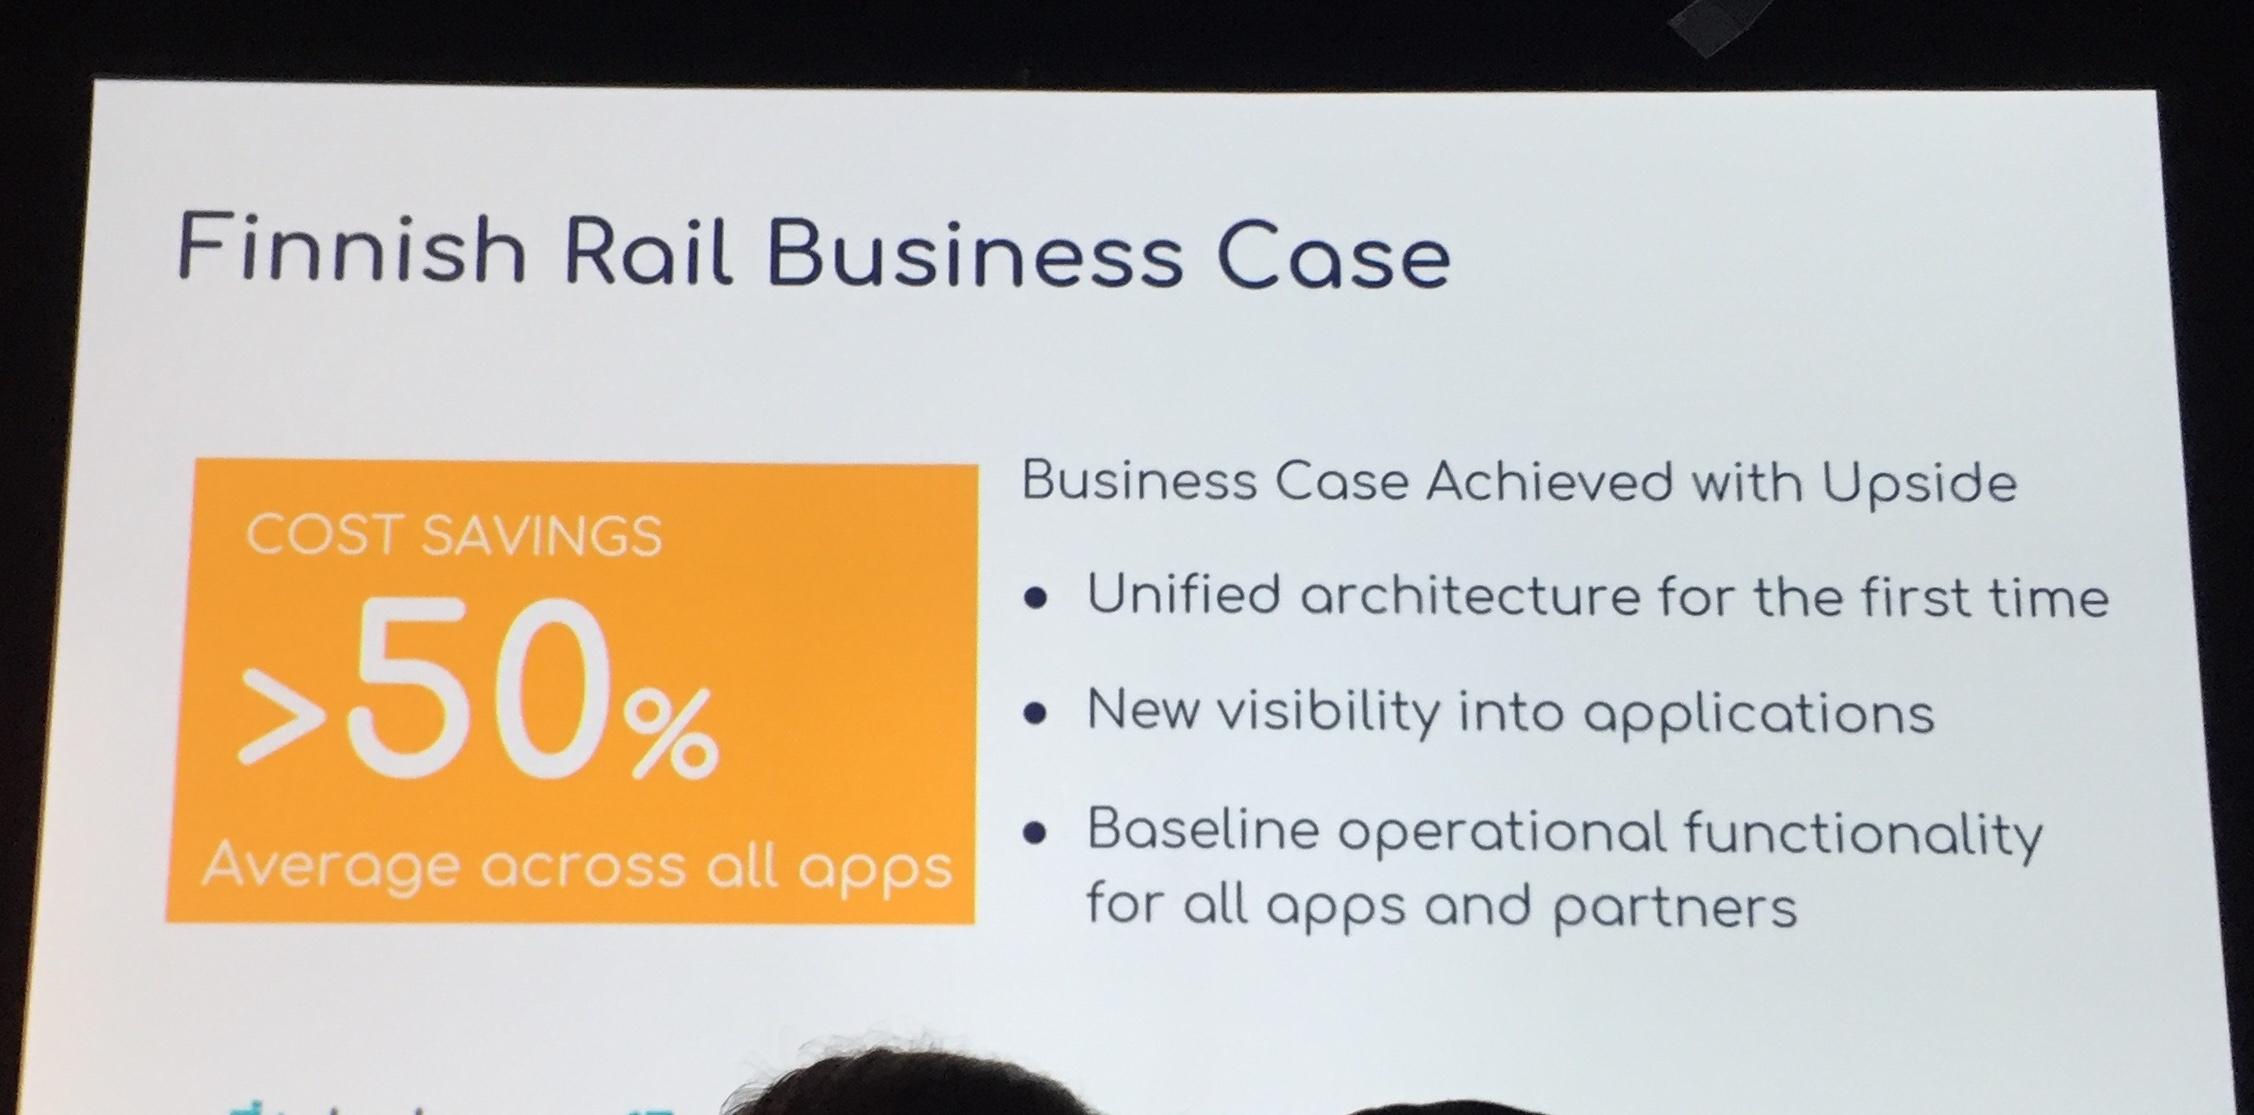 Finnish Rail Business Case Docker.jpg